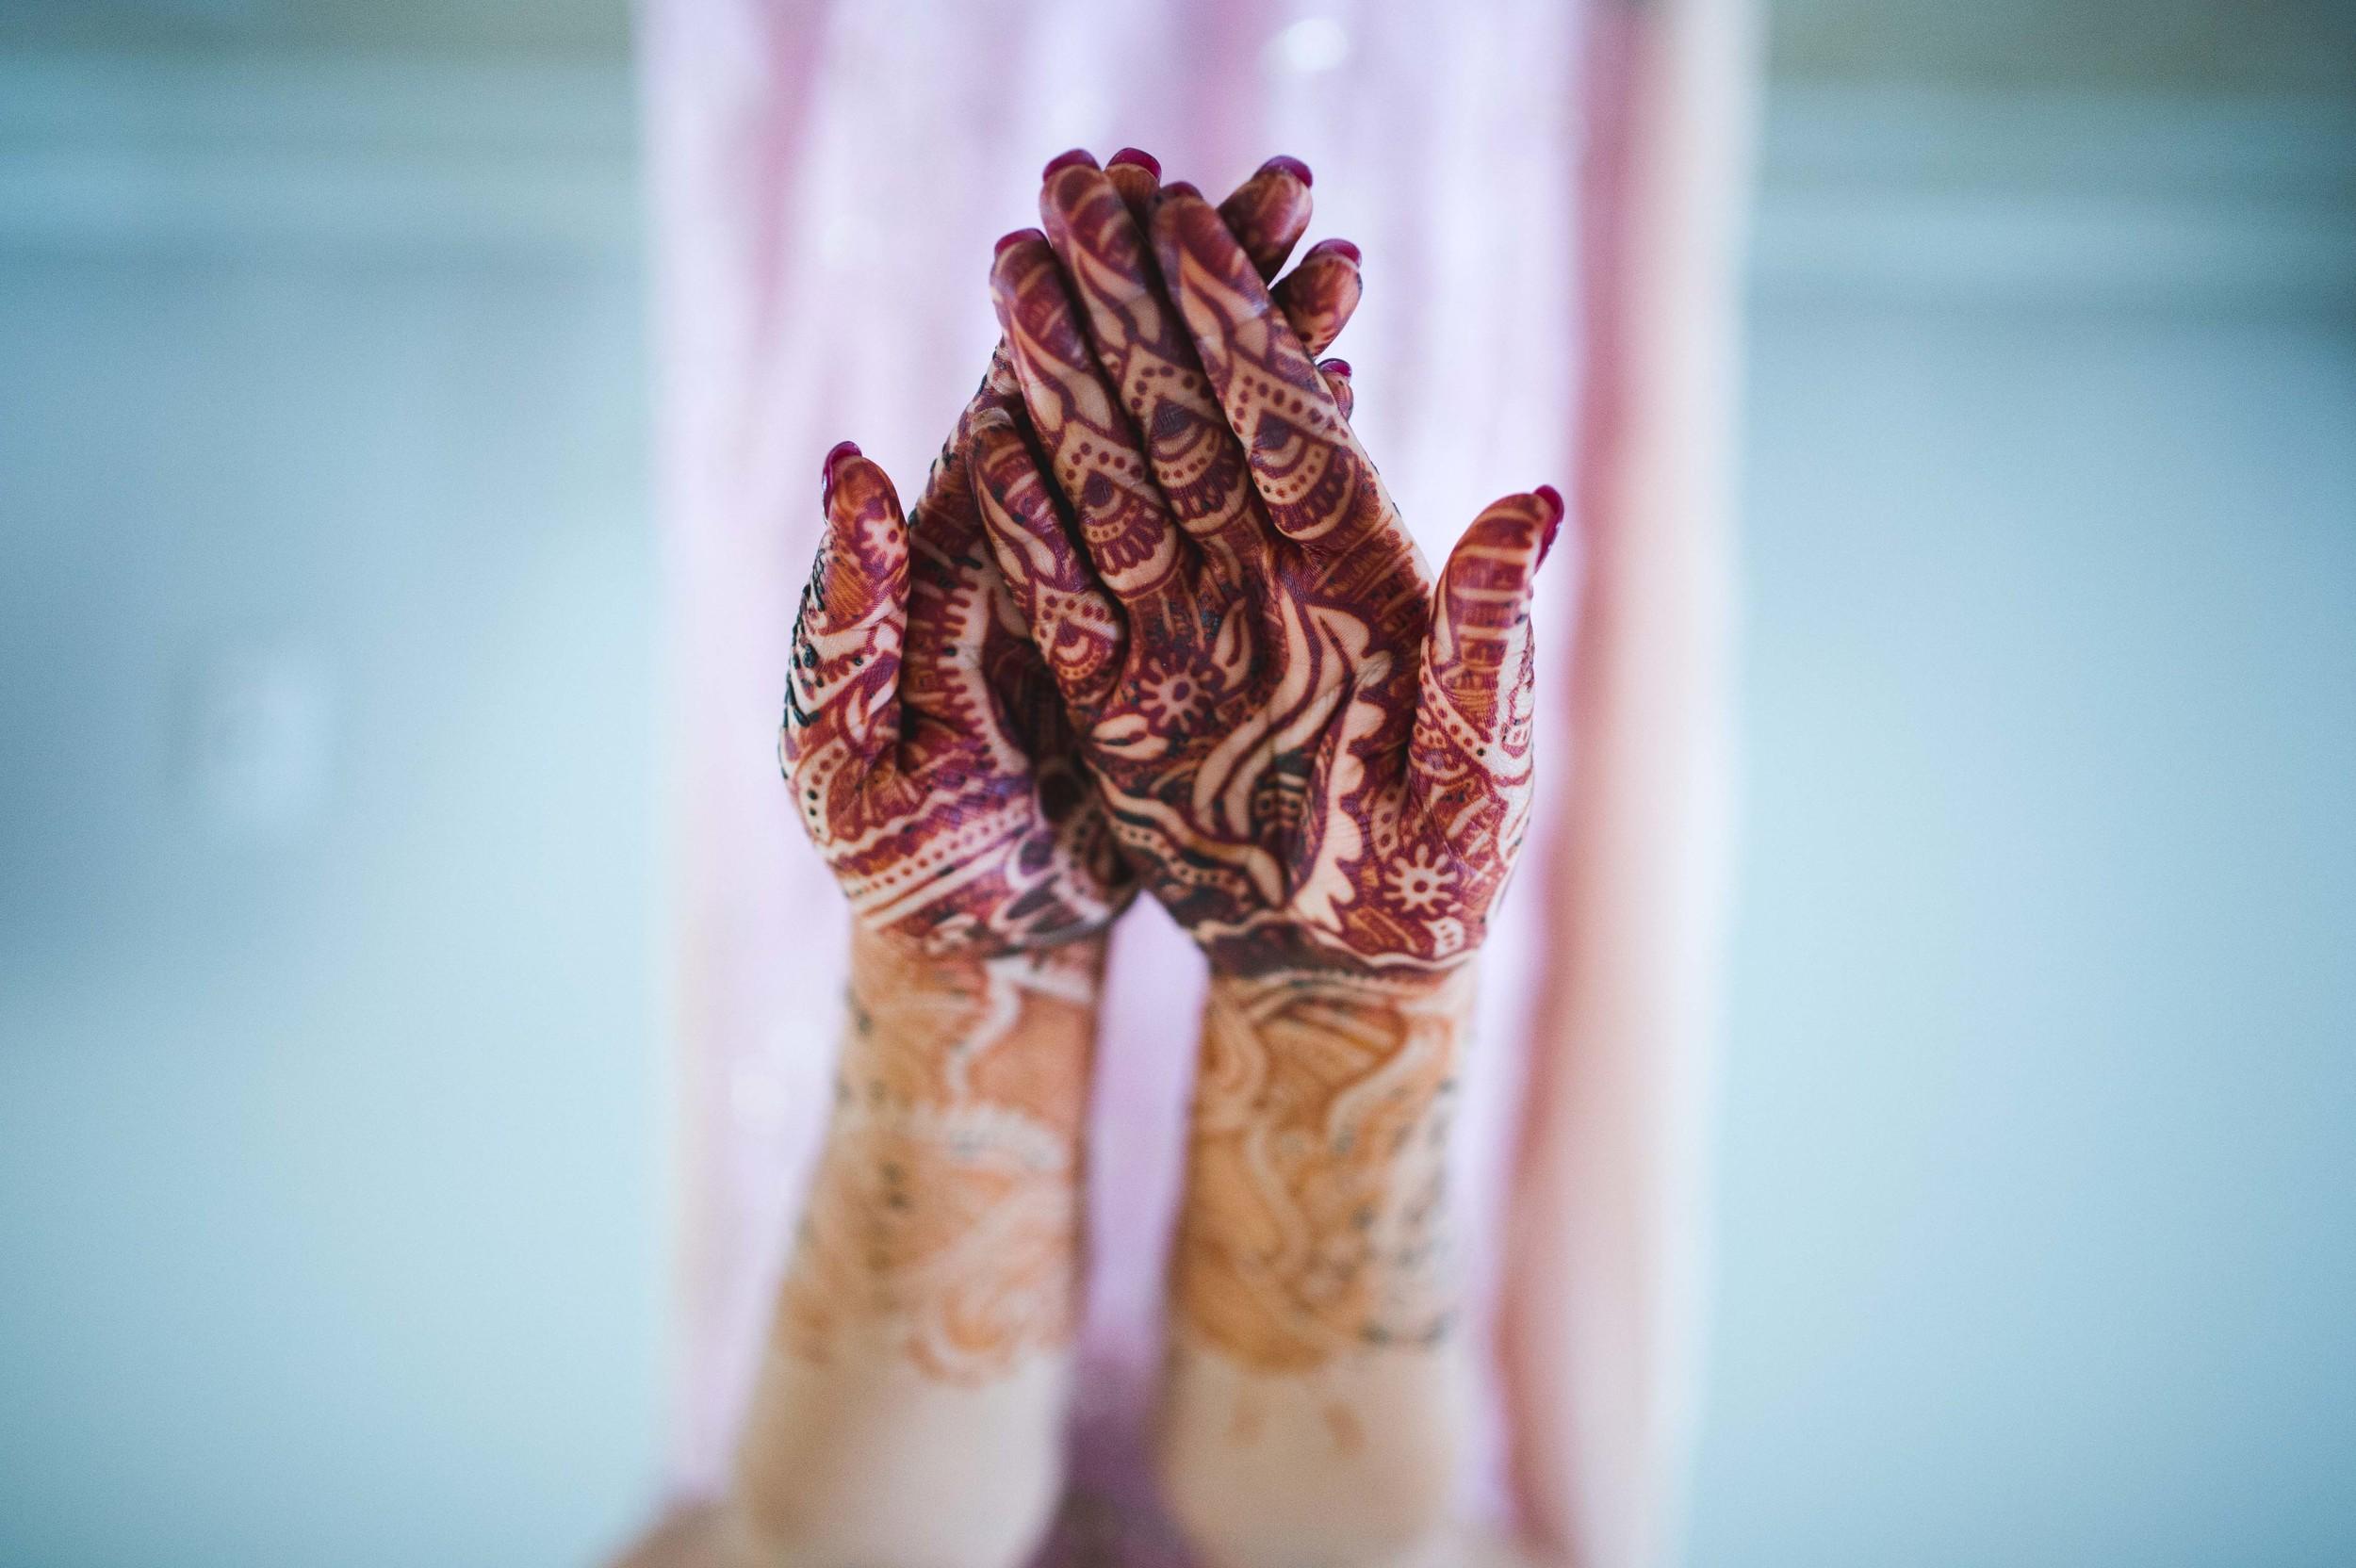 Indian Pre-wedding  at Arena Stage Washington DC by Mantas Kubilinskas-14.jpg